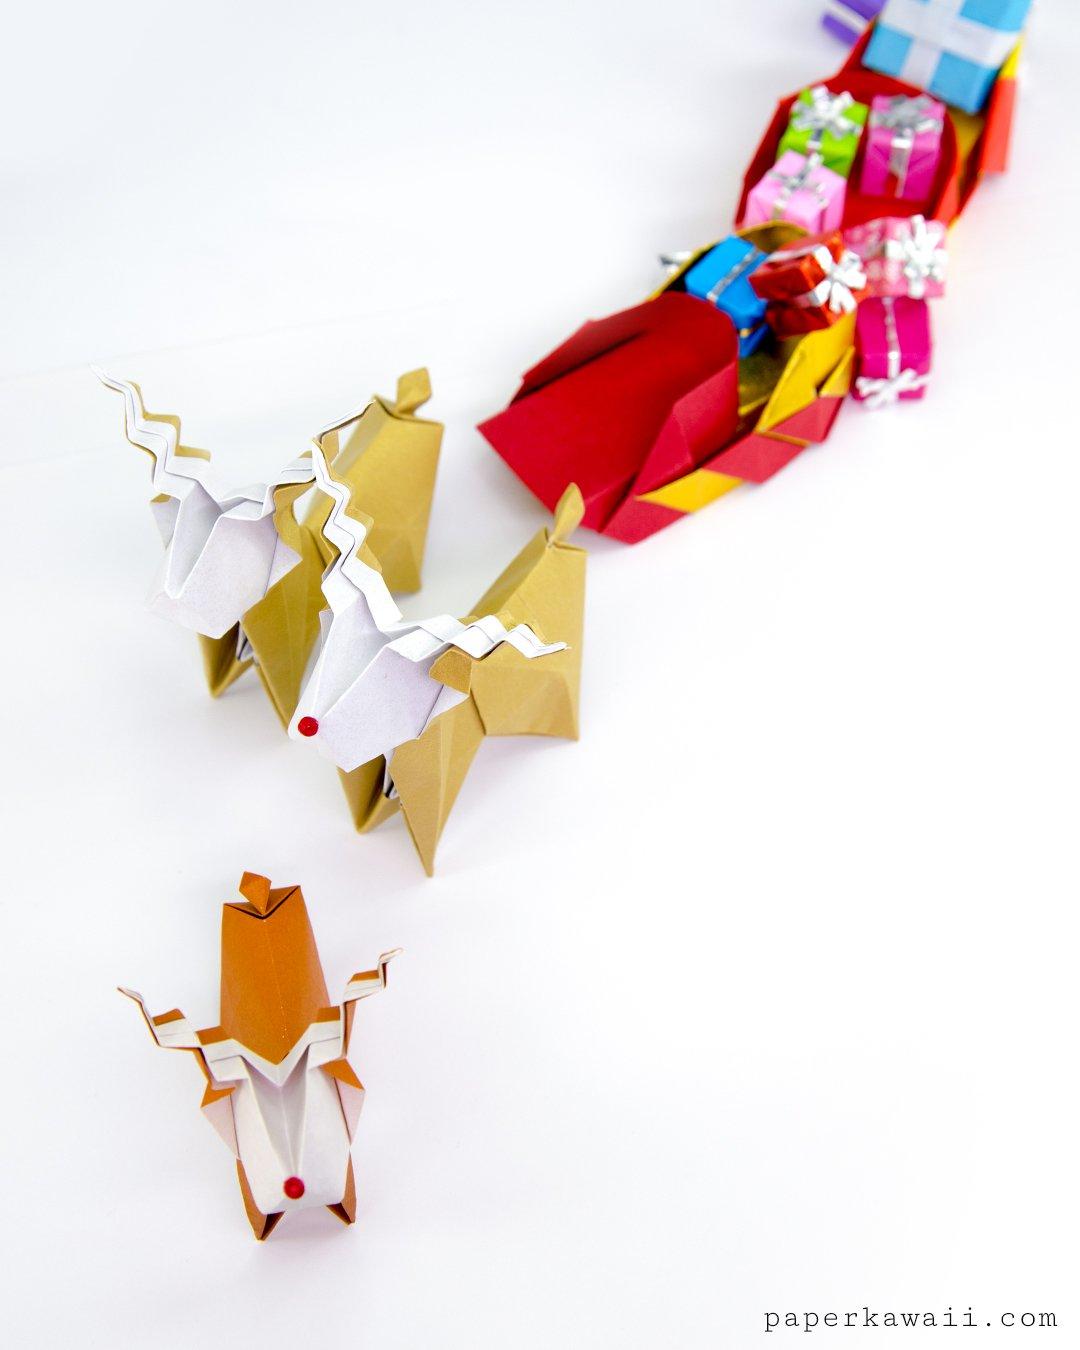 Origami Reindeer Tutorial - Make a cute paper Rudolf! via @paper_kawaii